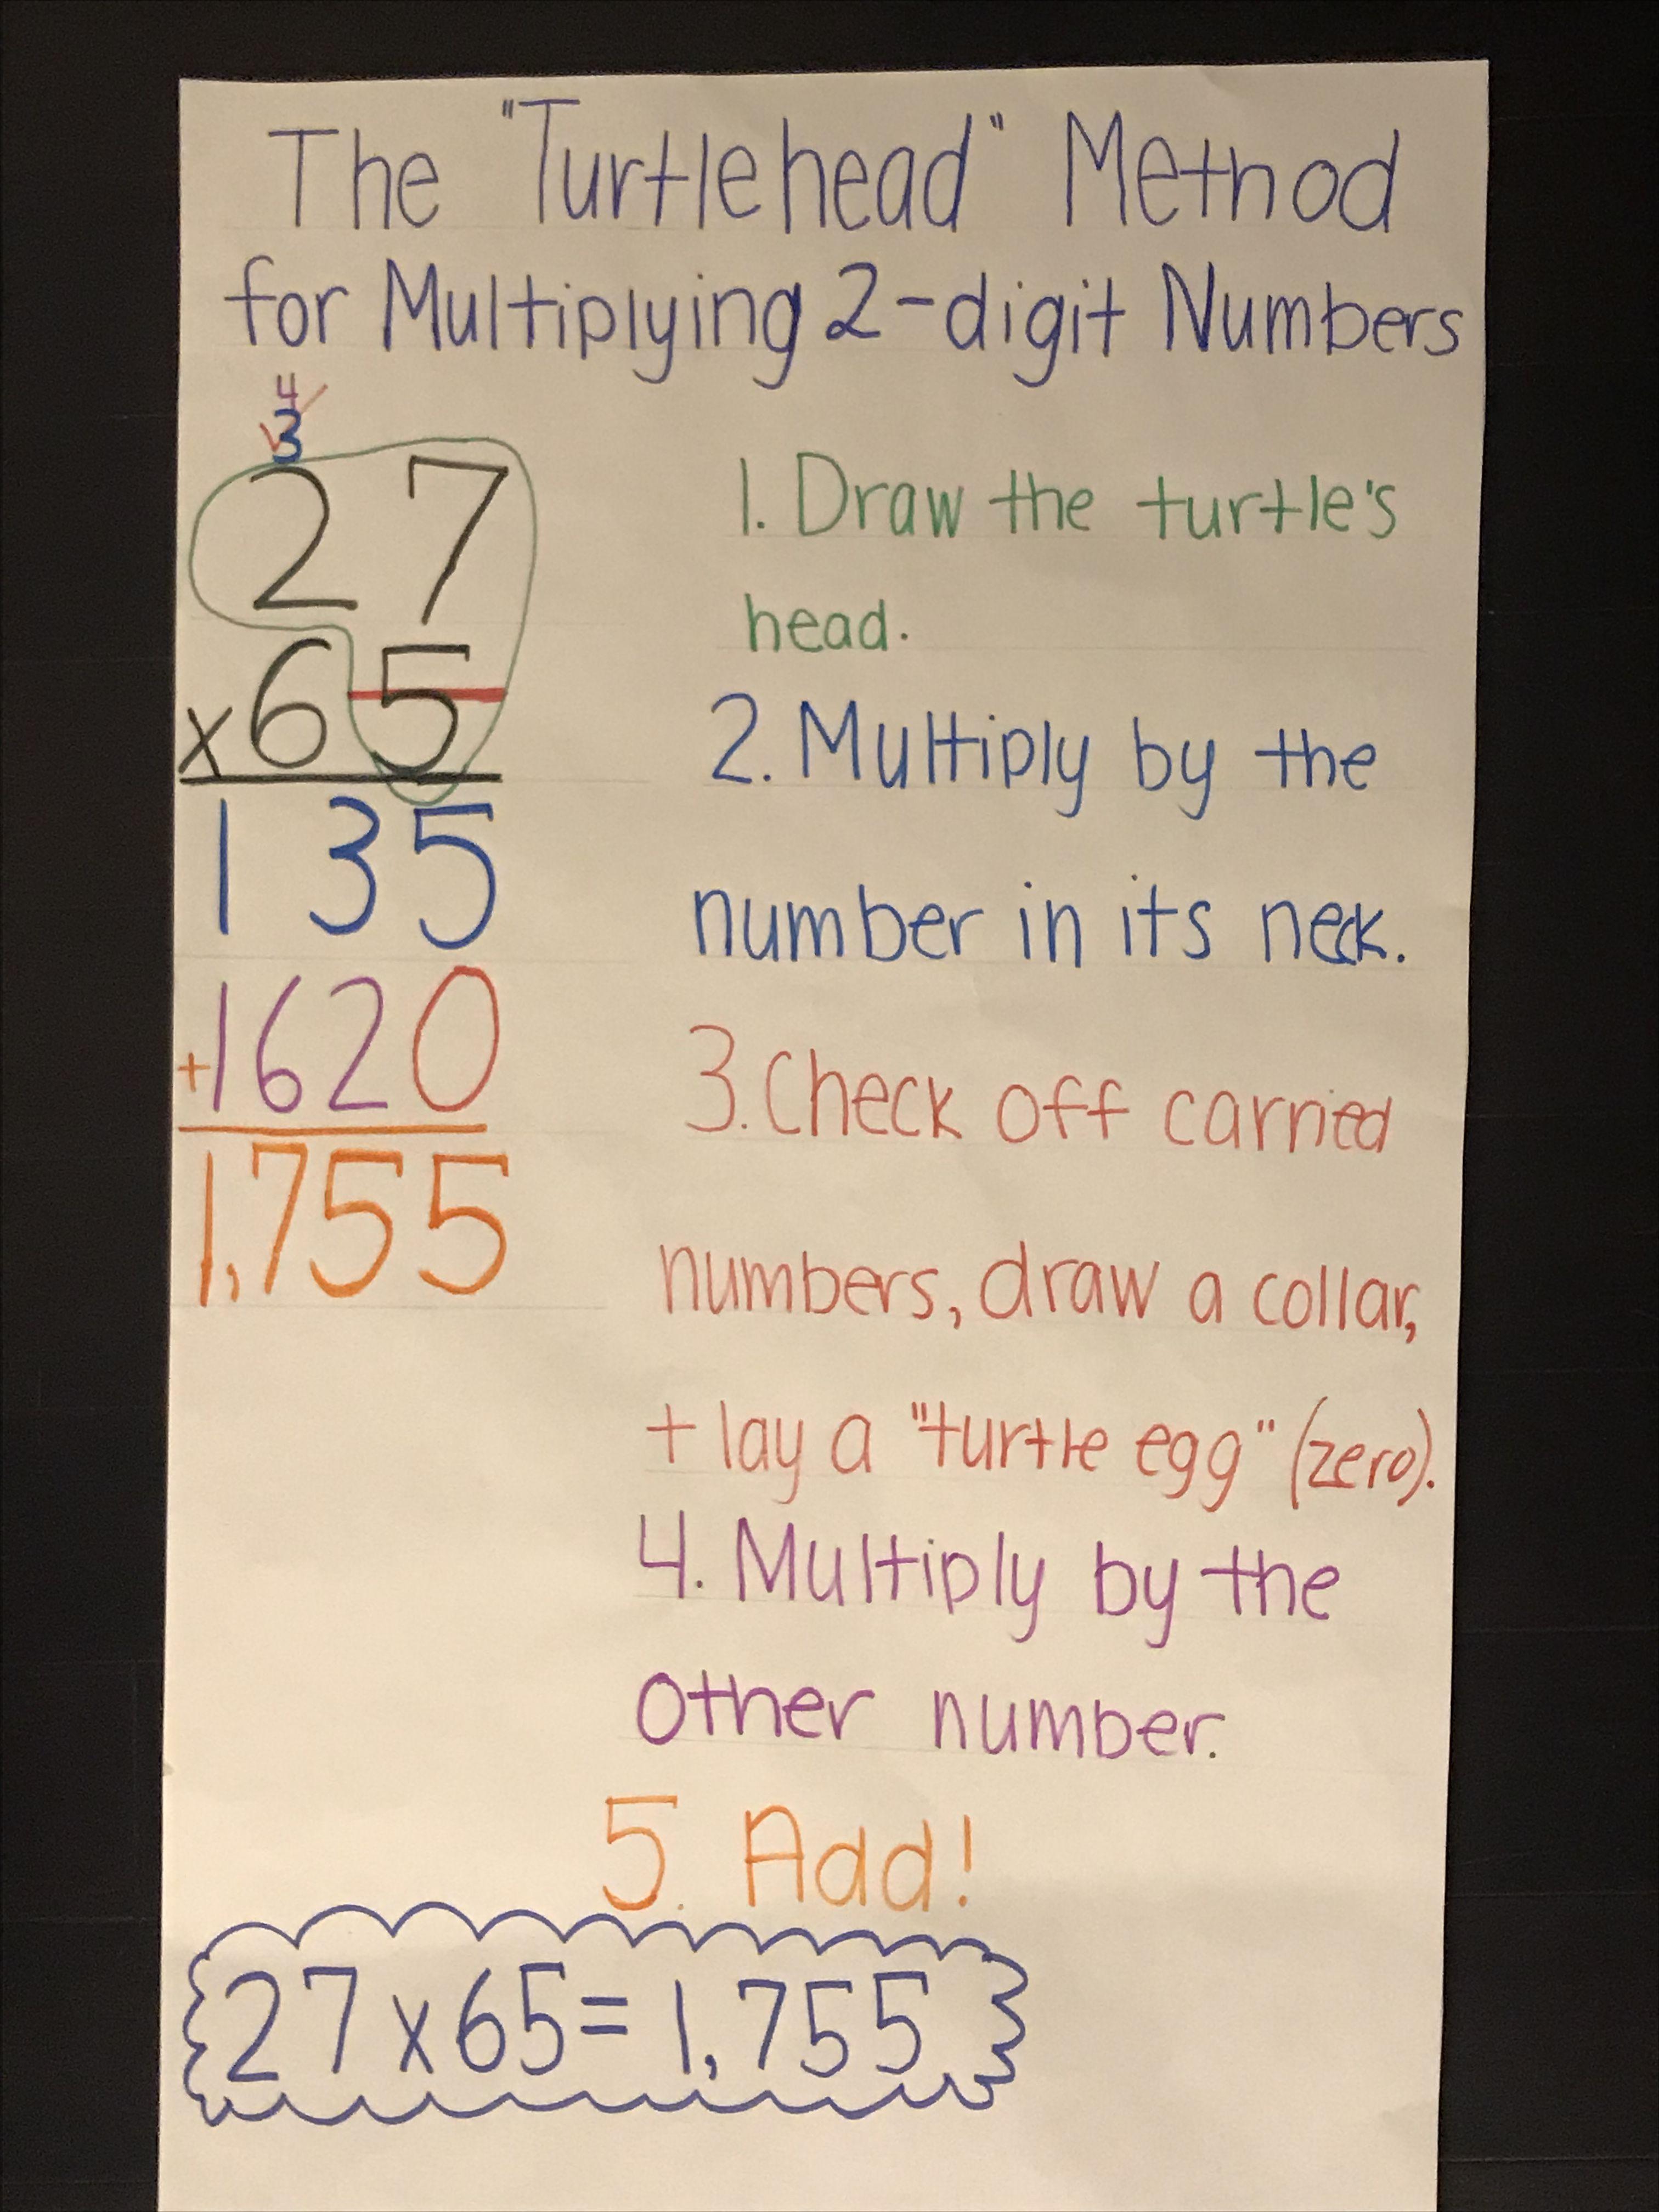 The Turtlehead Method For Solving 2 Digit Multiplication